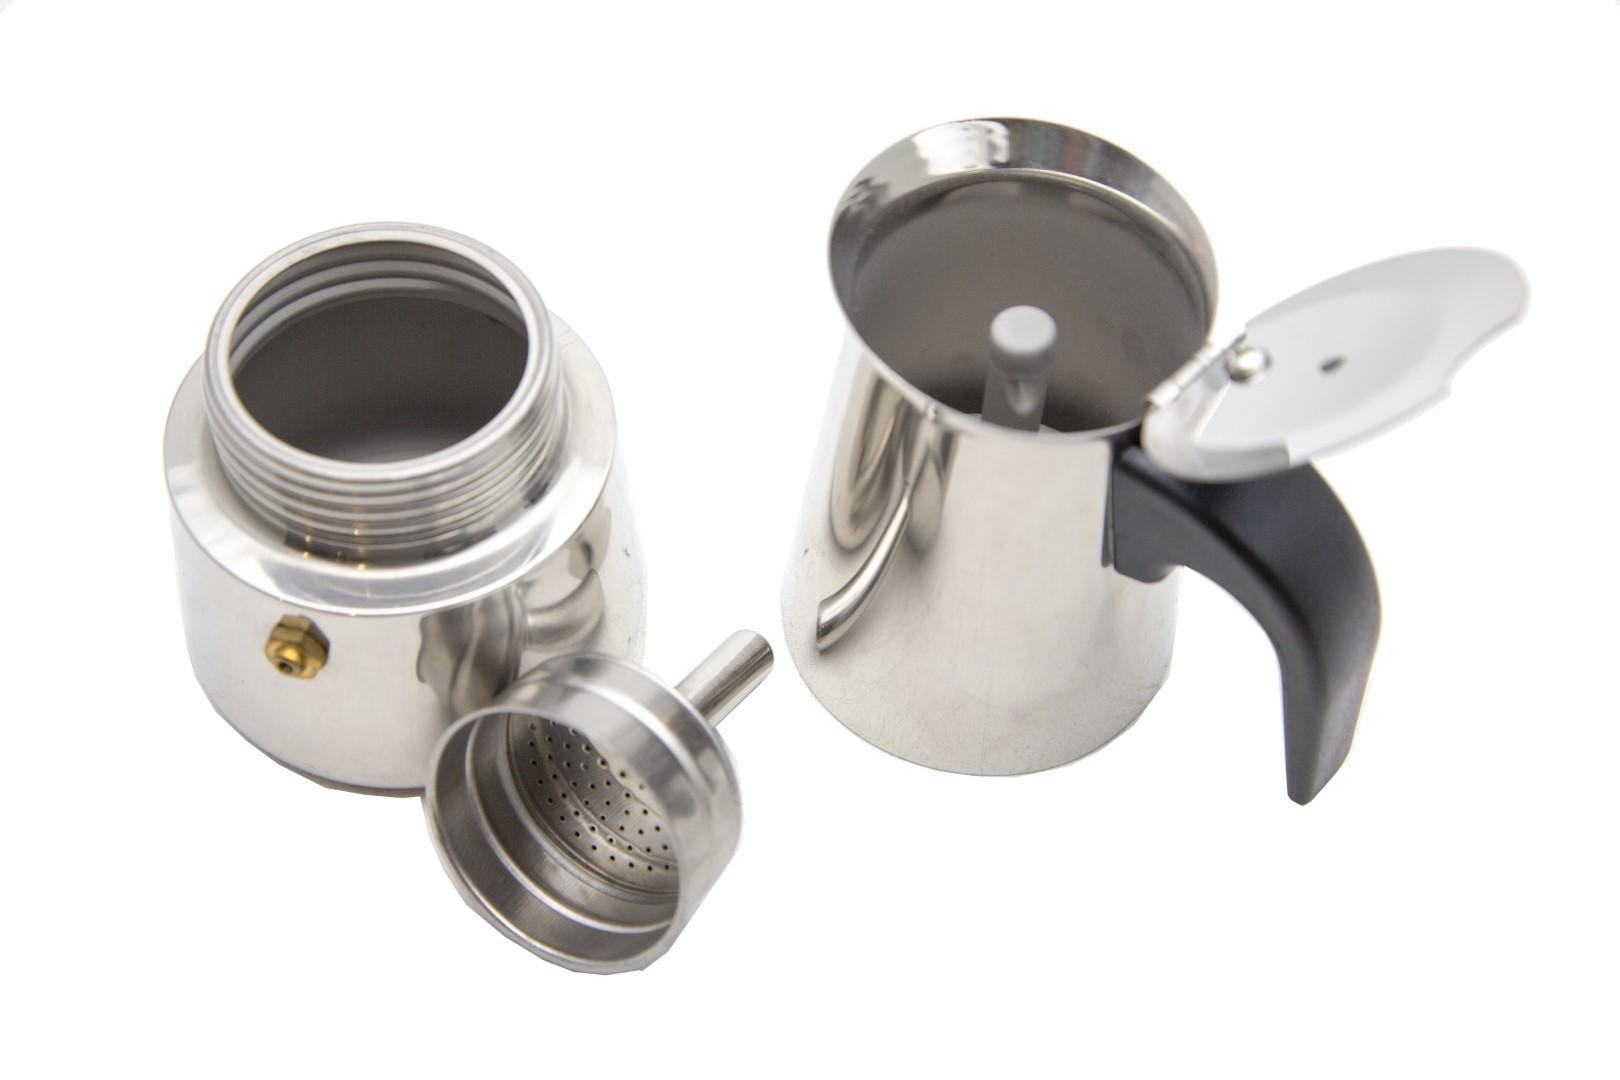 Detail Gambar HomeMaster Mocha/Moka/Espresso/Coffee/Kopi Maker Pot Teko 2 Cup 100 Ml MKHS2100 Terbaru